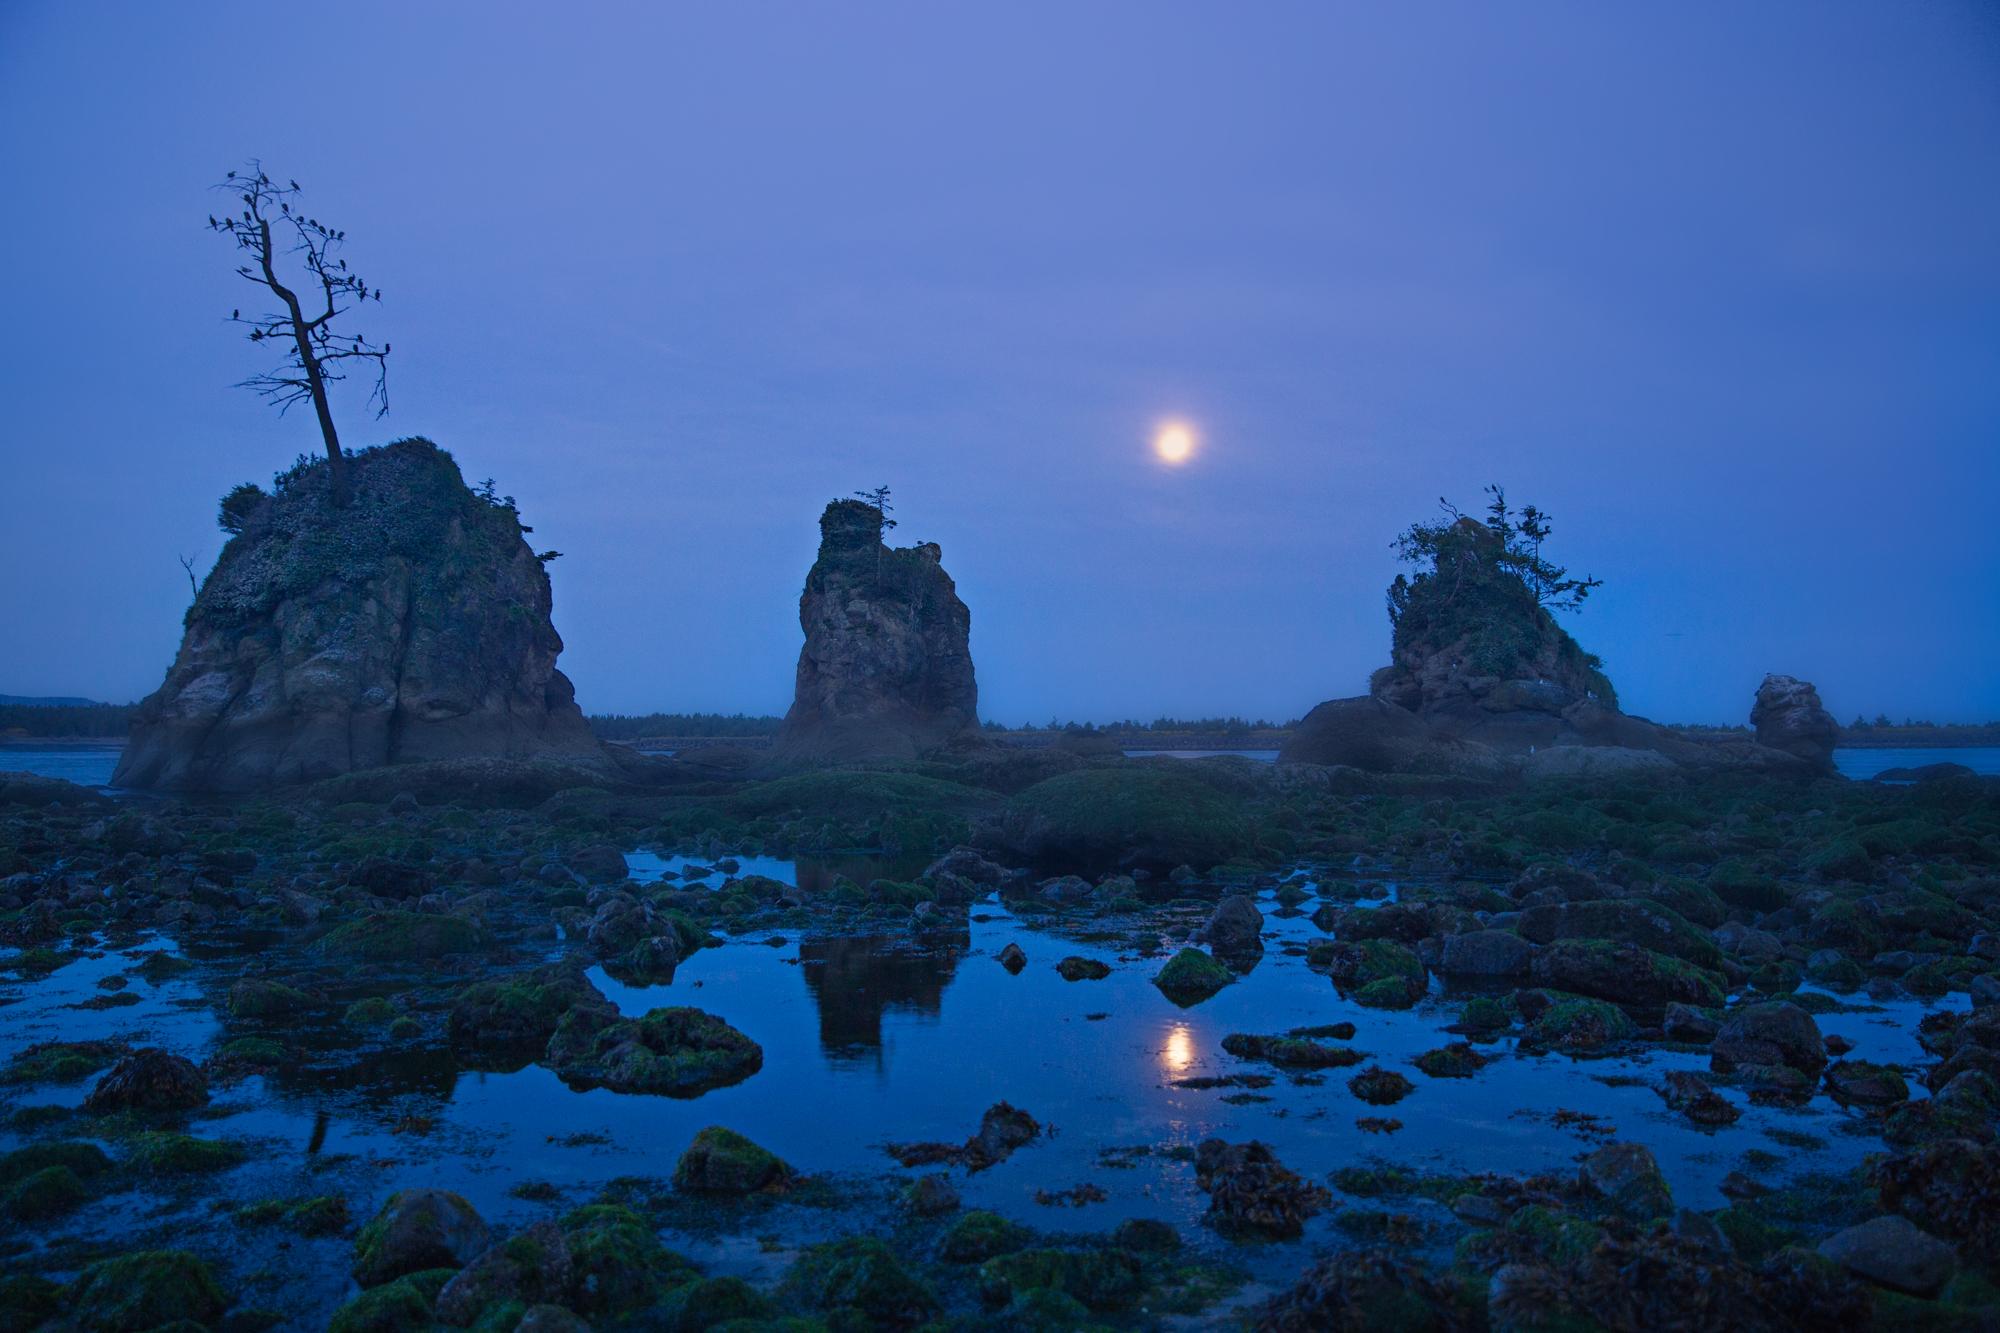 IMG_9770full moon by the sea stacks.jpg